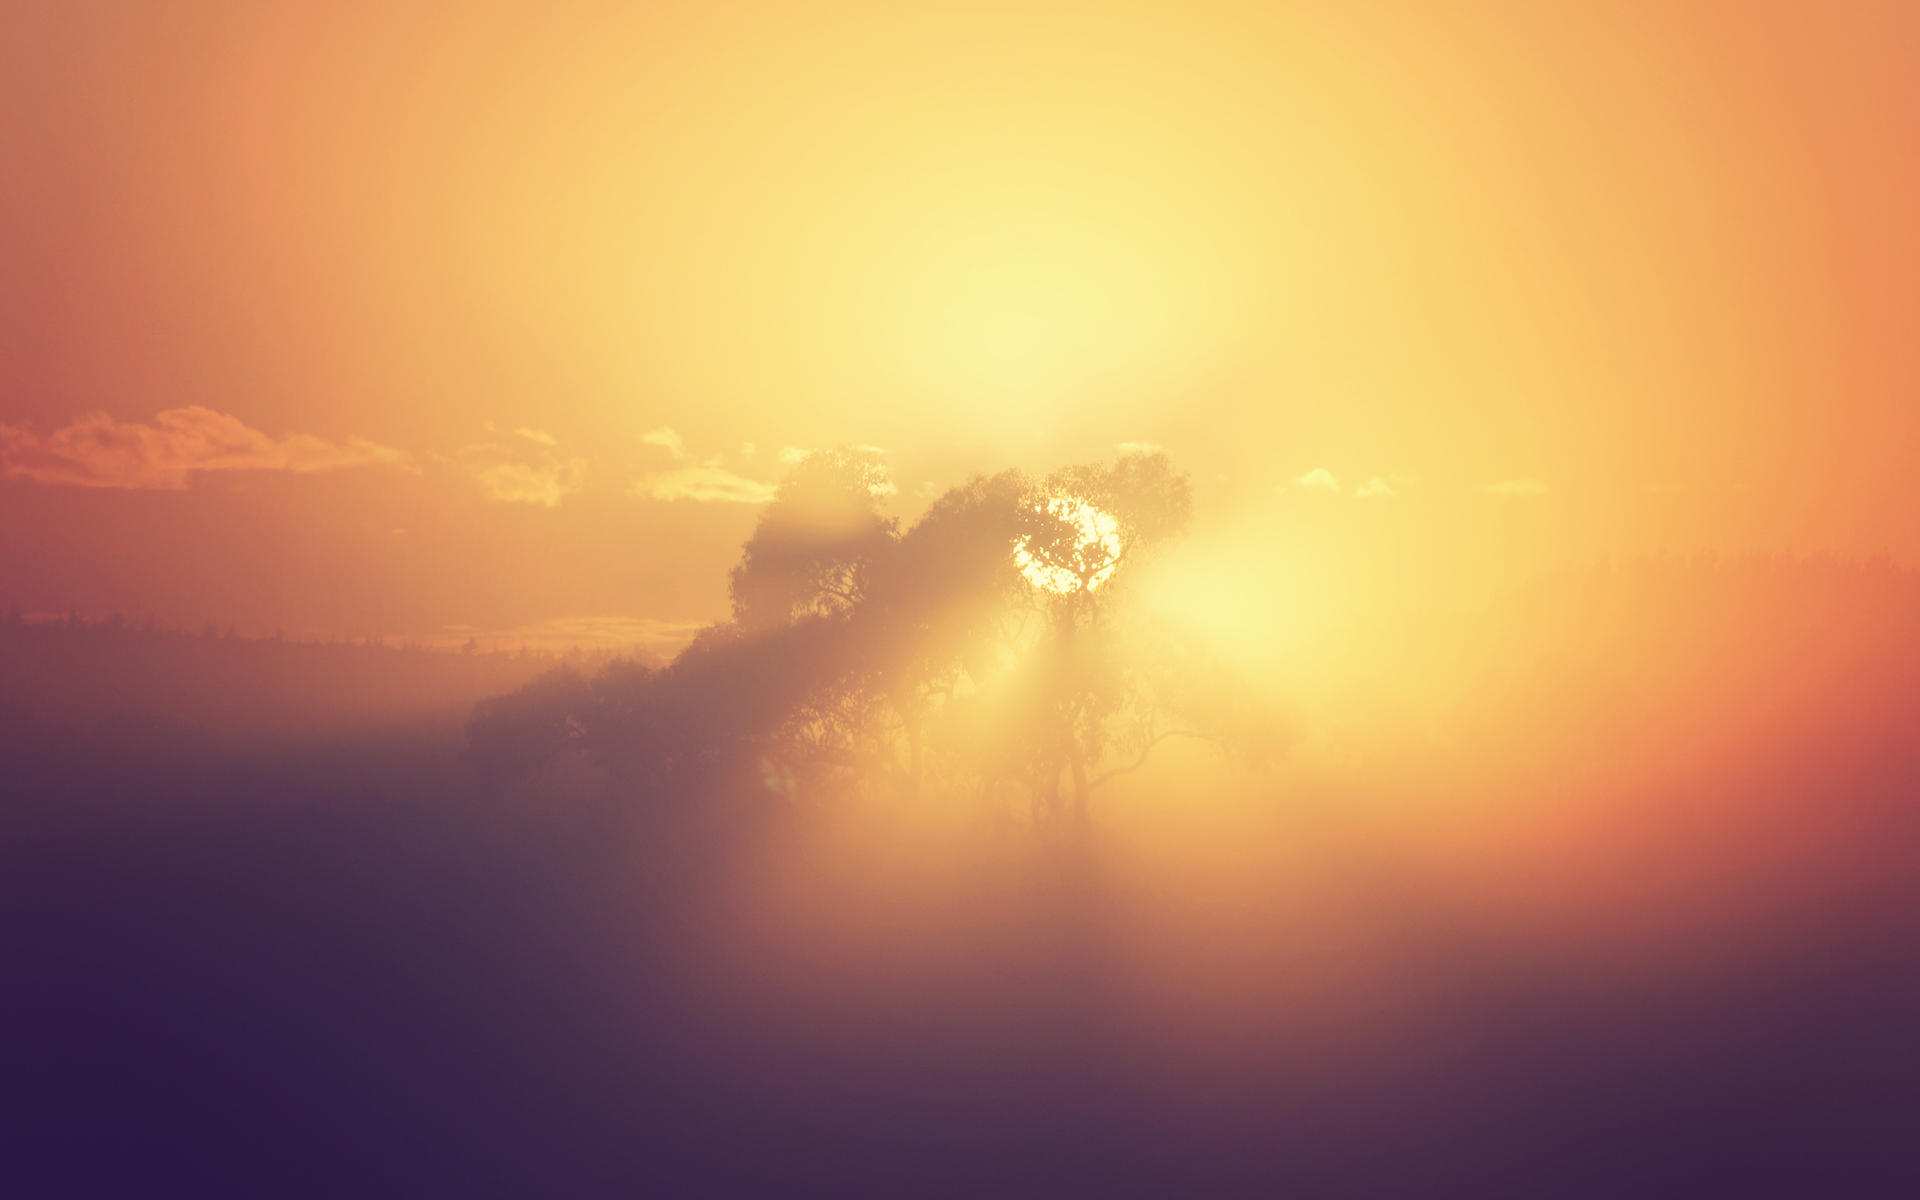 Morning sunrise by benfinix on deviantart for Morning sunrise images